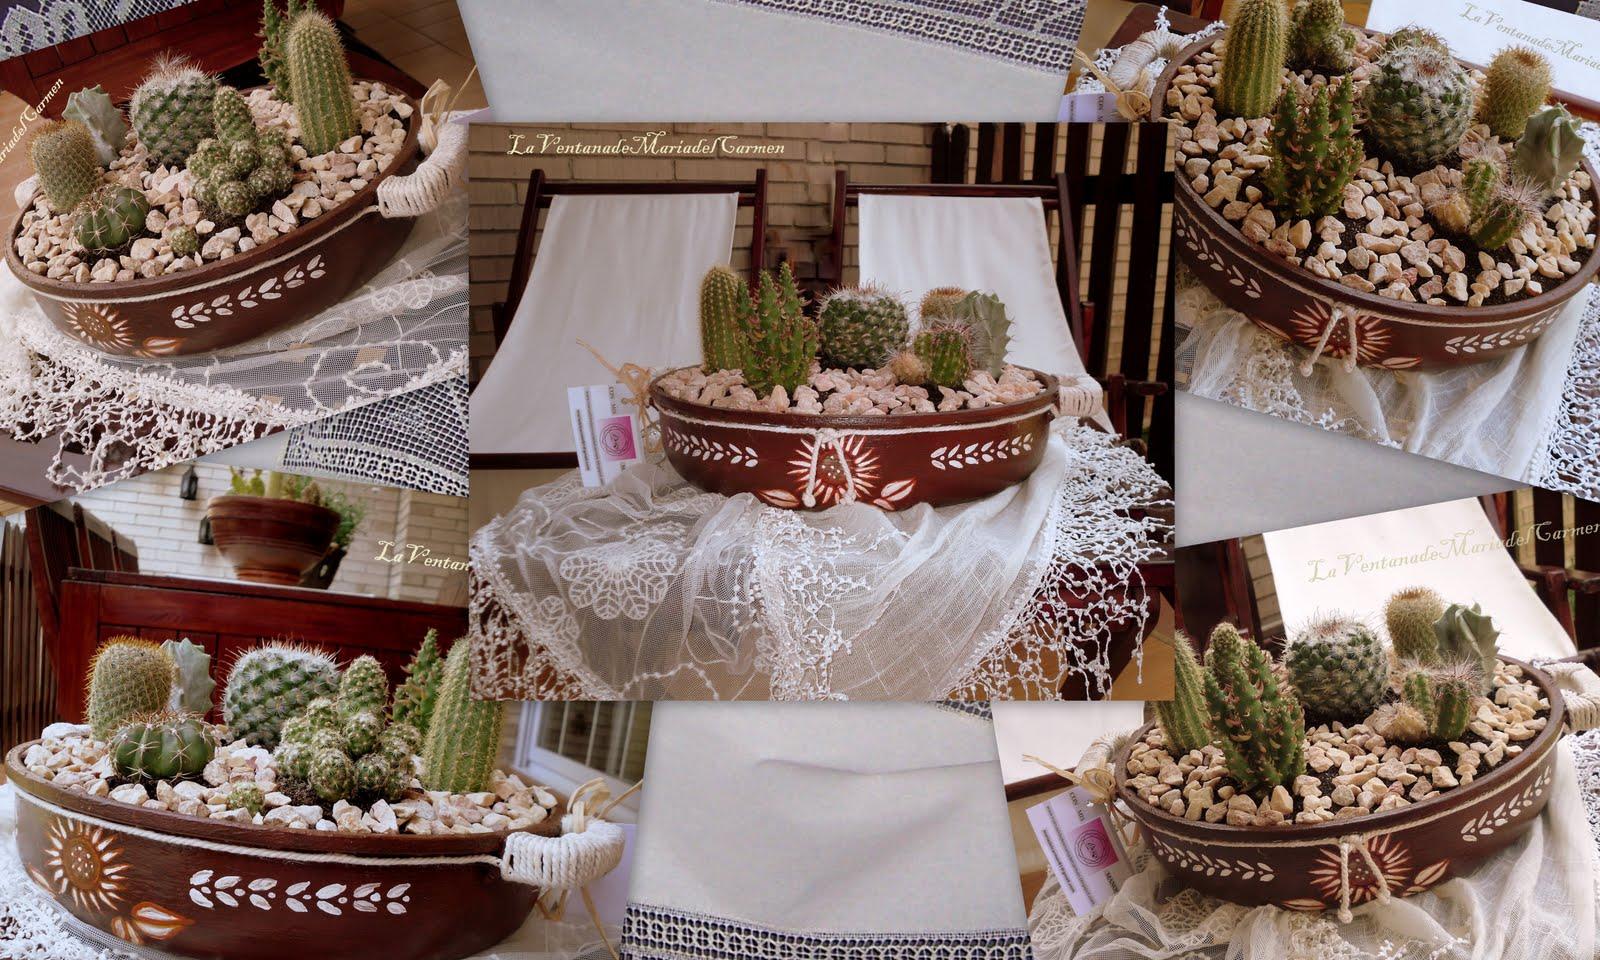 Manualidades la ventana de maria del carmen chicas for Como reciclar una mesa de tv vieja